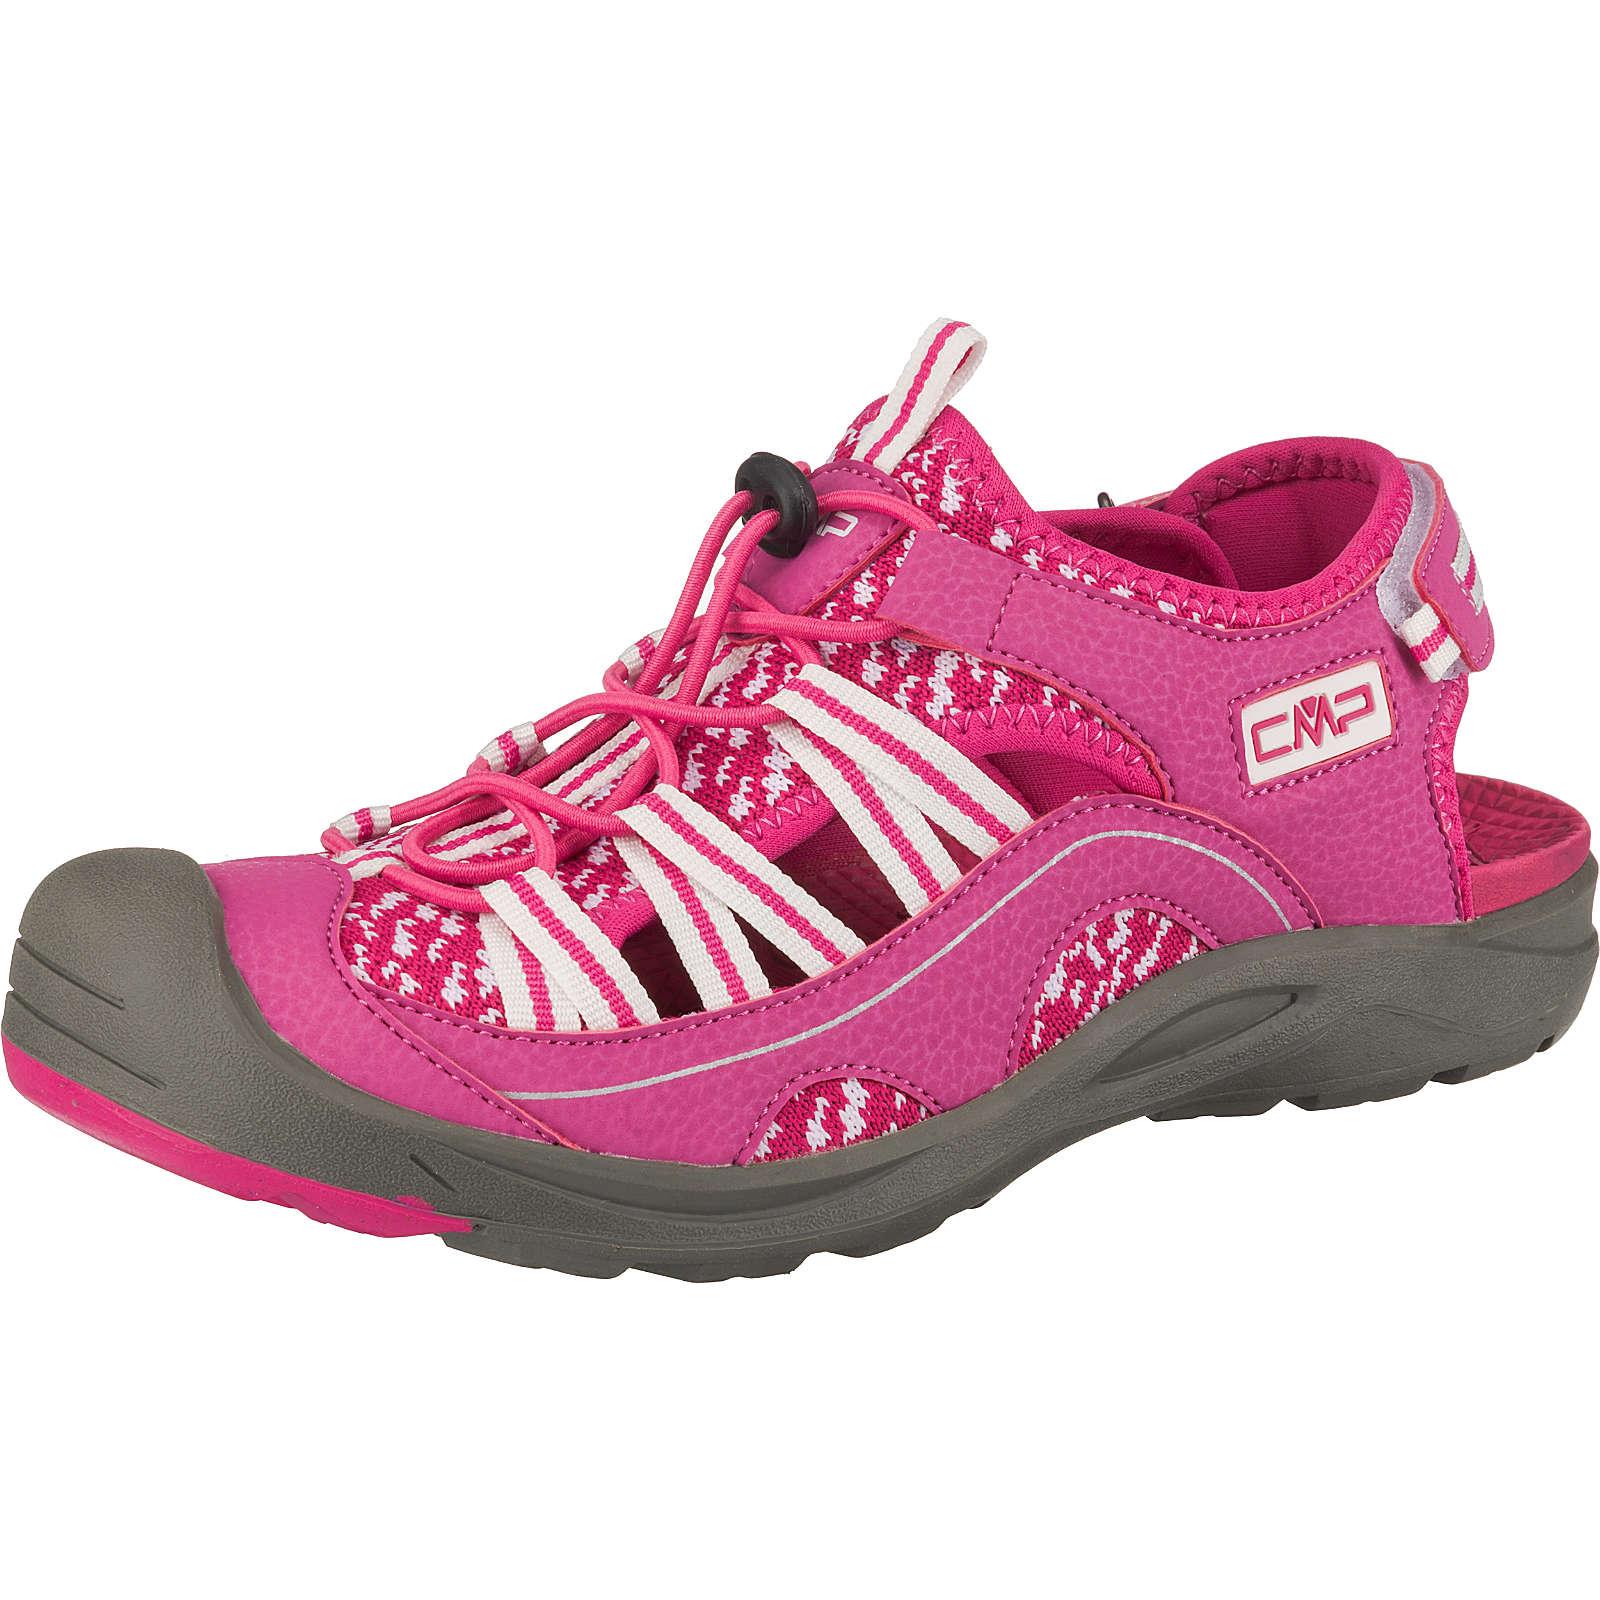 CMP ADHARA WMN HIKING SANDAL Outdoorsandalen pink Damen Gr. 38